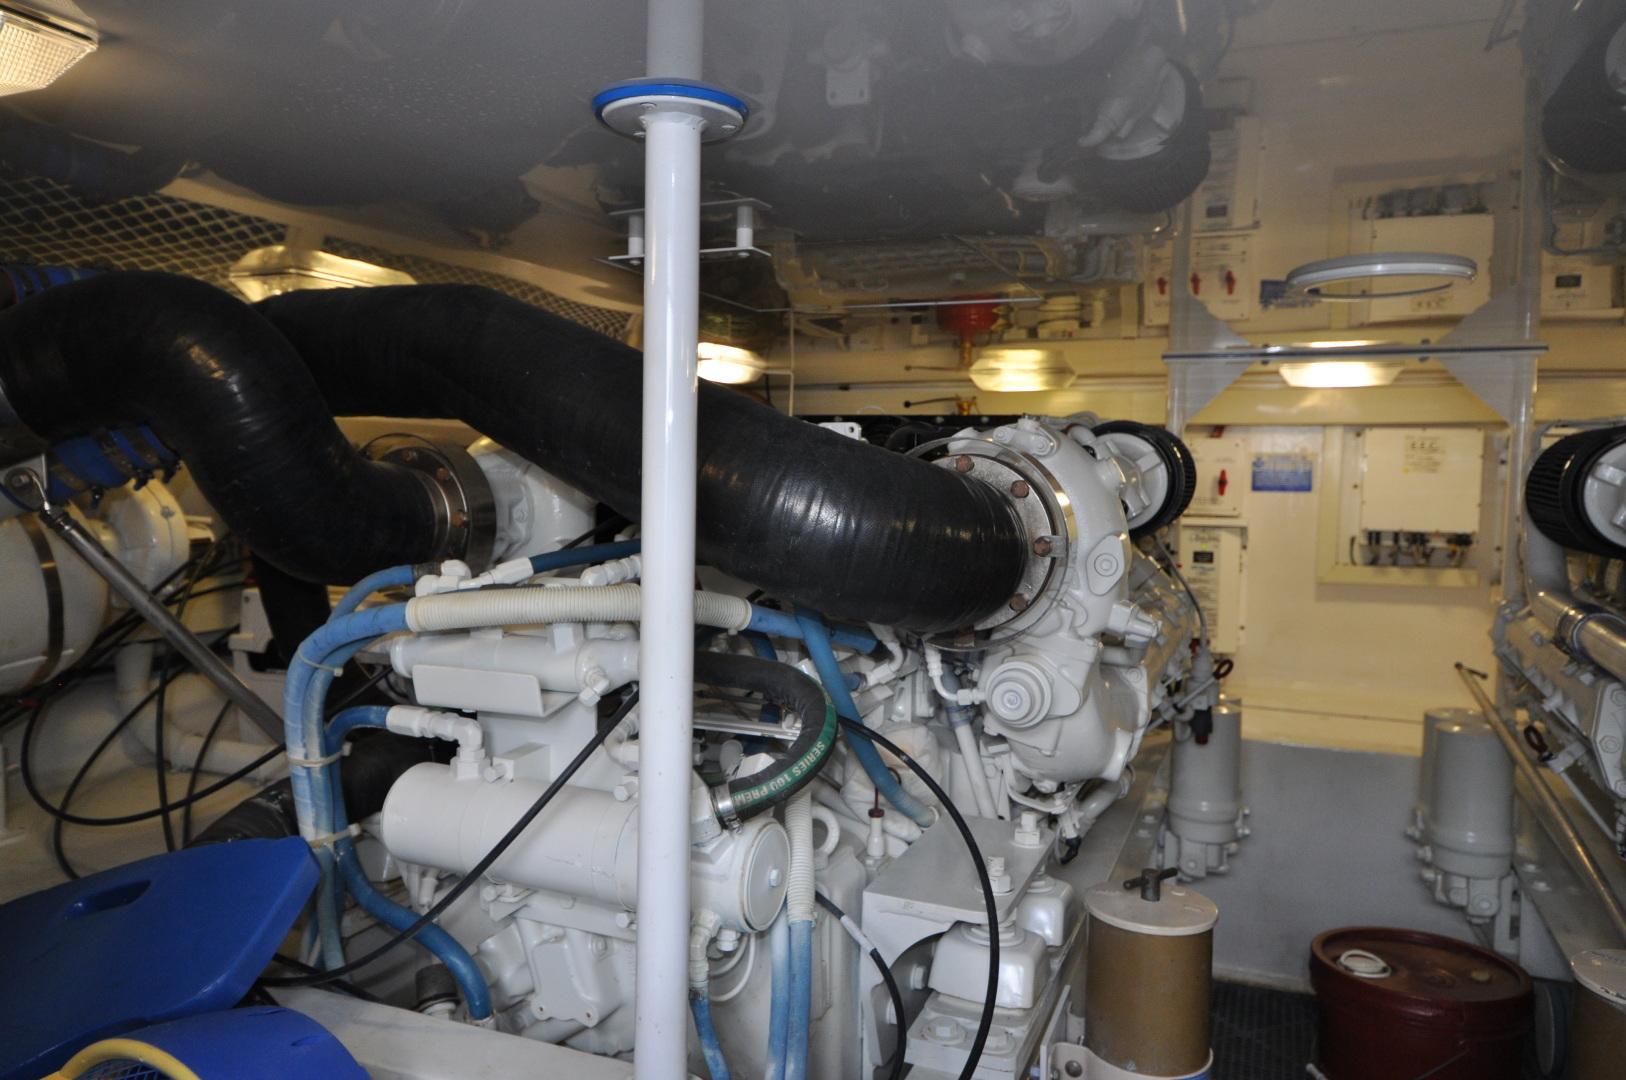 Viking-Convertible 2003-Reel Cowboy Deerfield Beach-Florida-United States-Engine Room-1546883 | Thumbnail